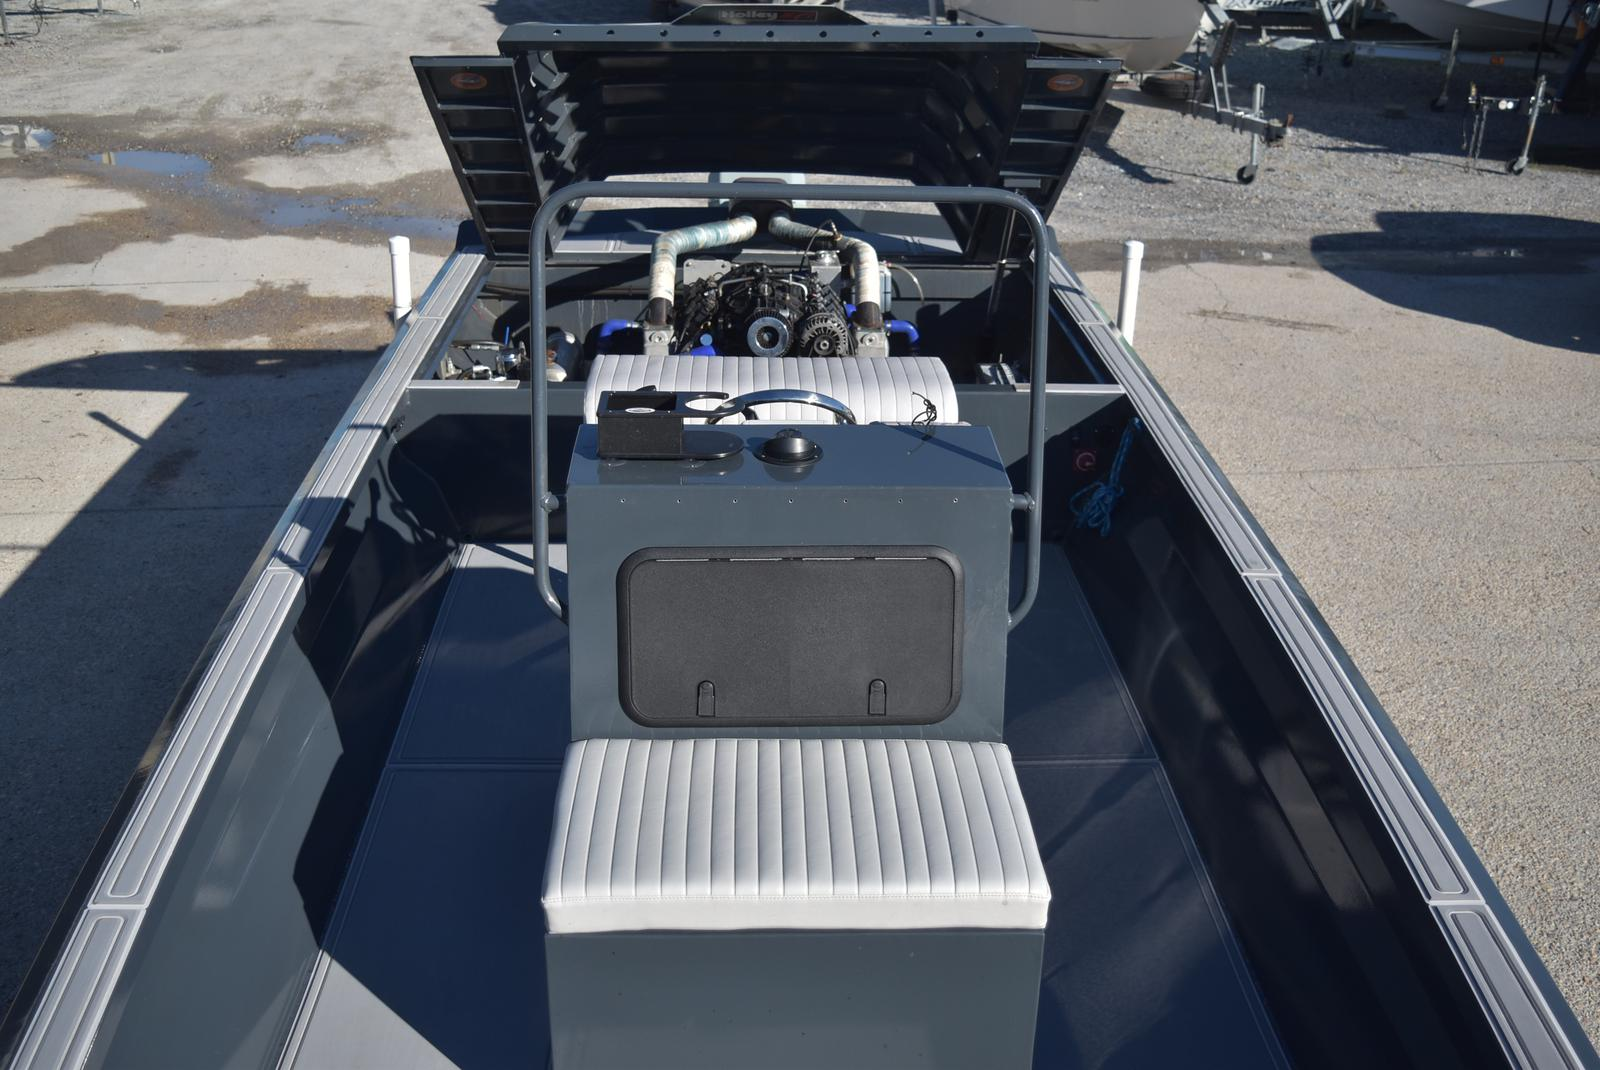 2018 Swamp Shark boat for sale, model of the boat is Custom & Image # 7 of 15